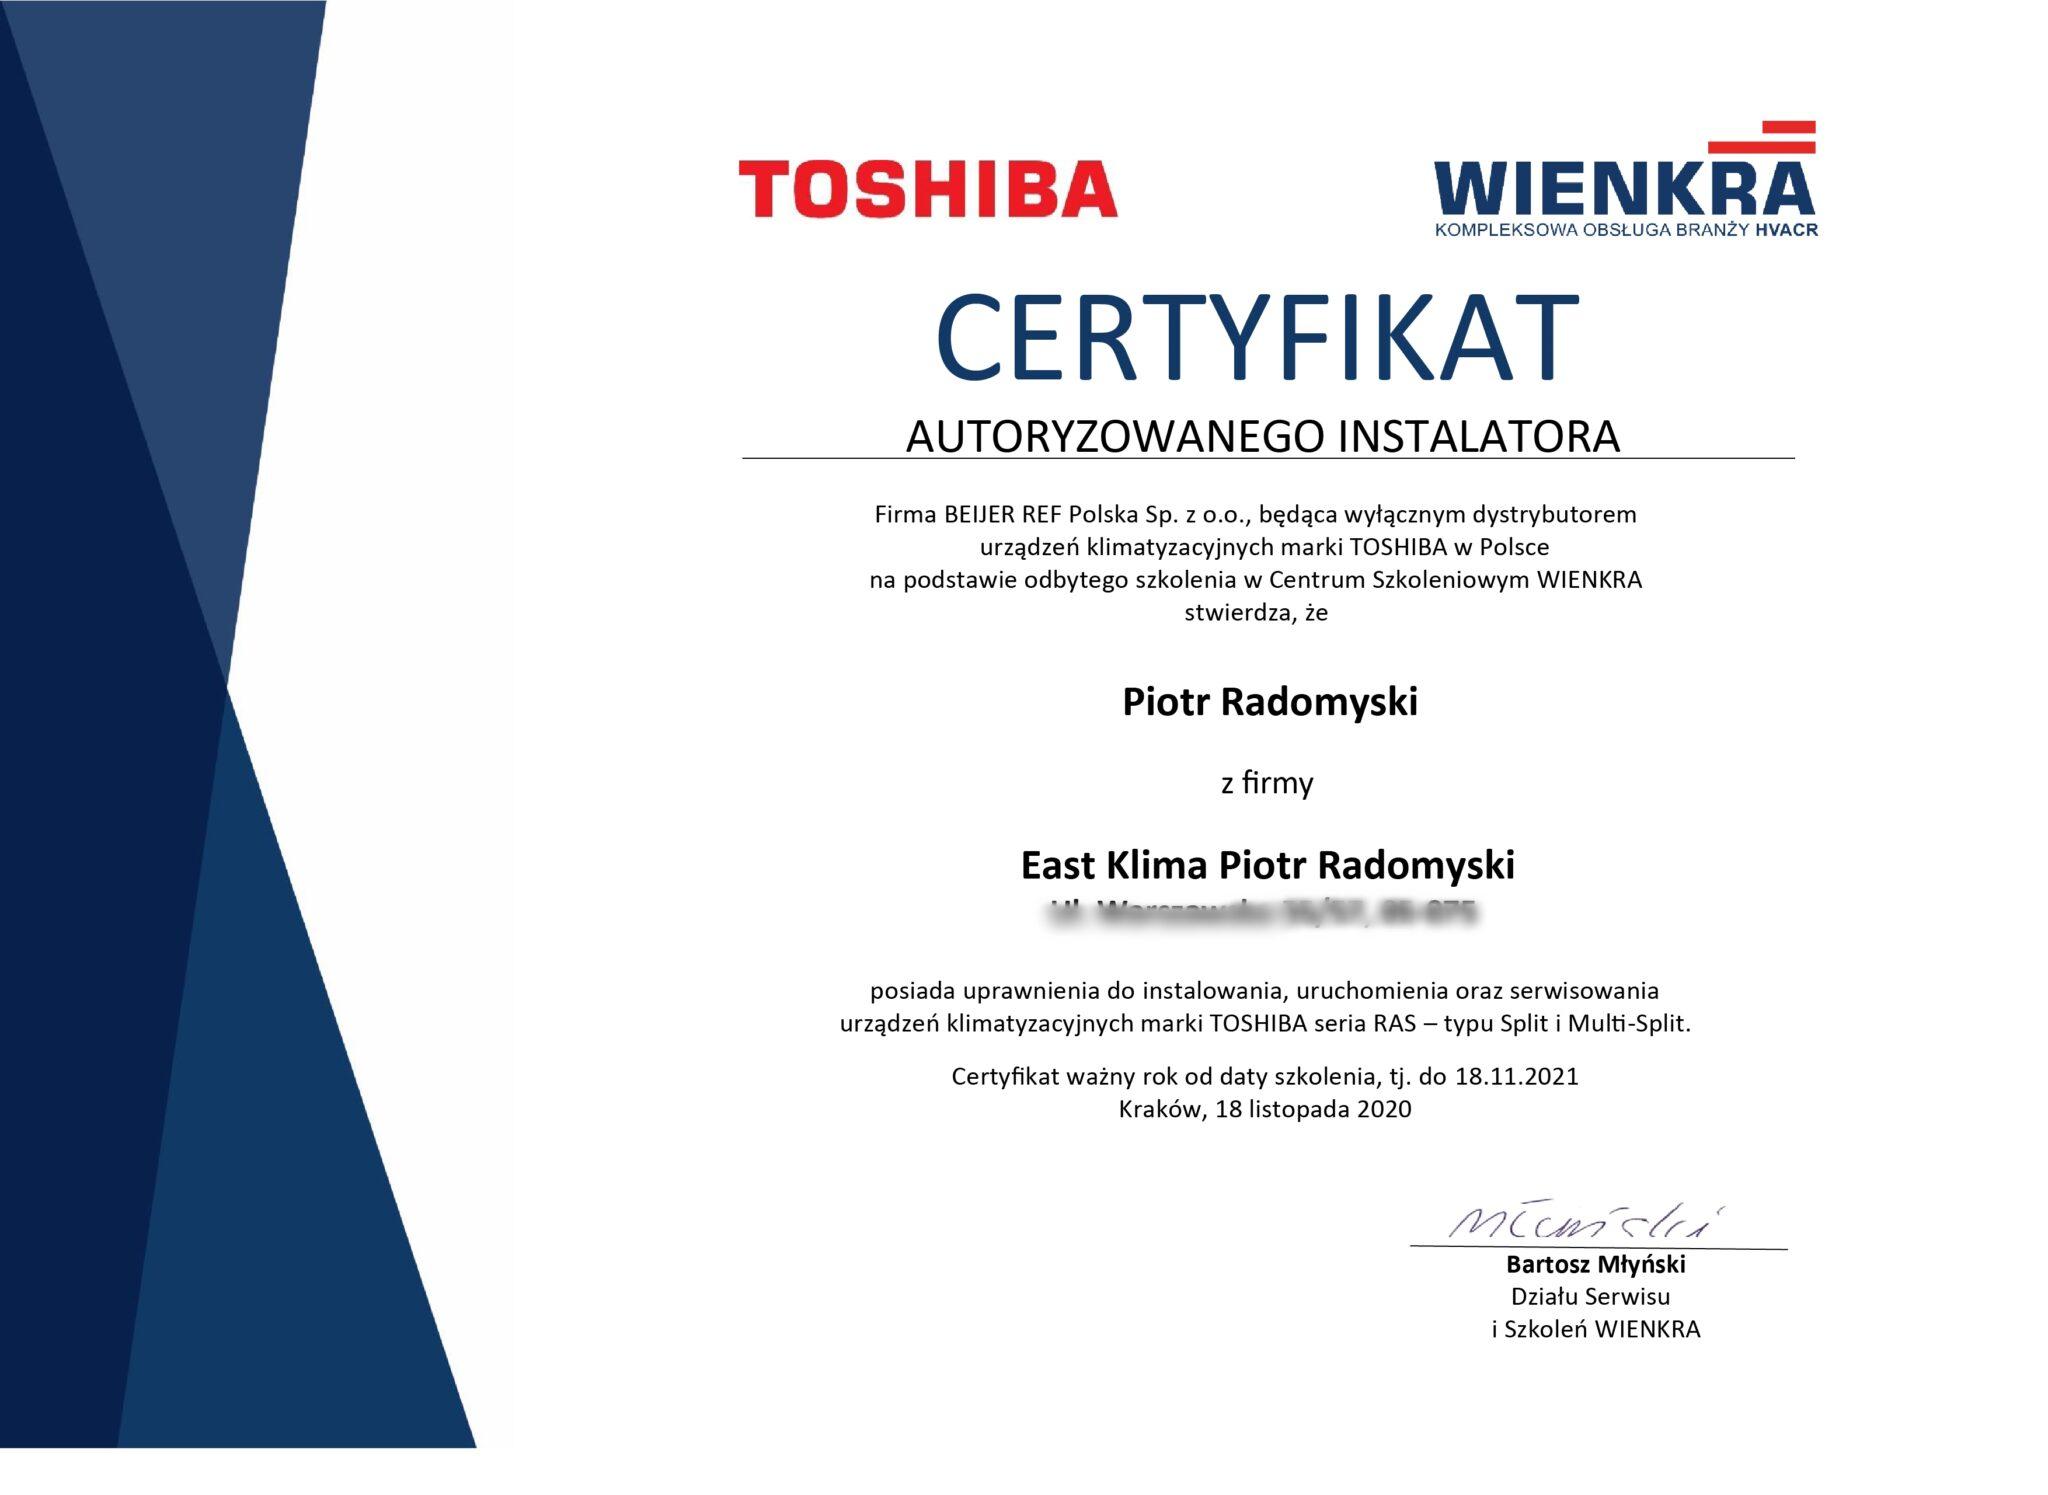 certyfikaty 18-11-2020 Toshiba Piotr Radomyski_